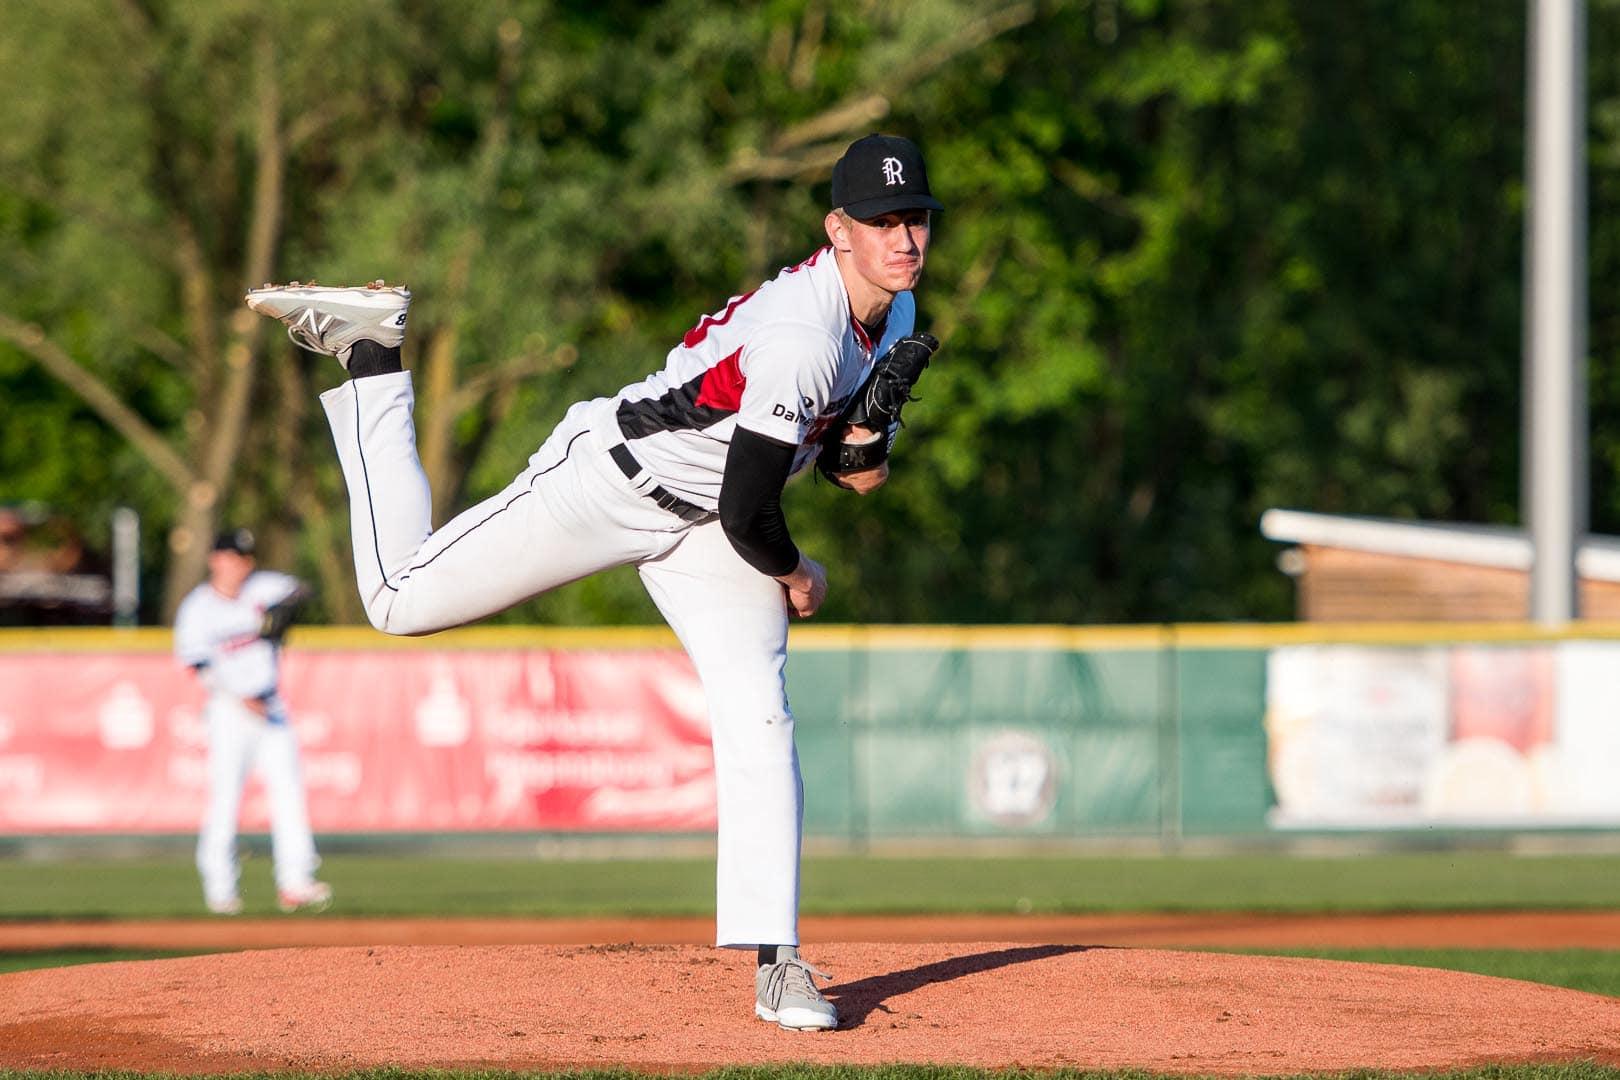 In Corona-Saison von Anfang an gefordert Baseball: Buchbinder Legionäre gegen Ulm Falcons / US-Profi Niklas Rimmel spielt für Regensburg